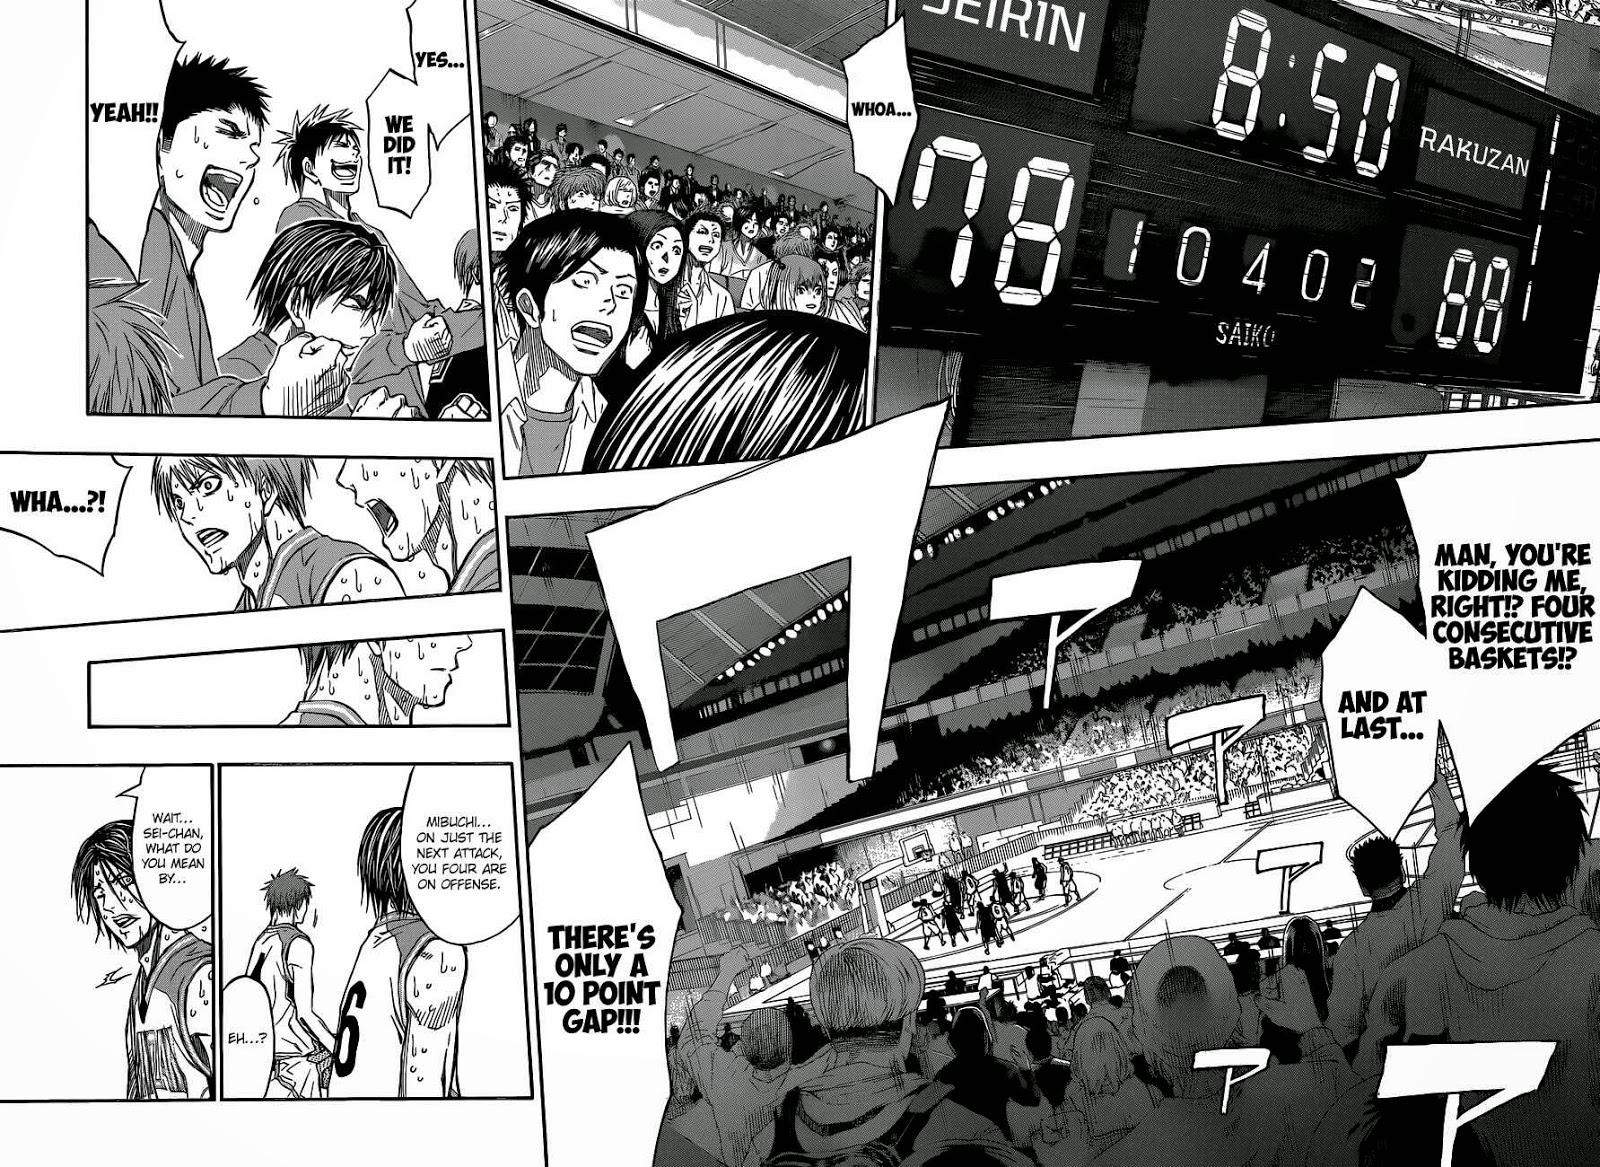 Kuroko no Basket Manga Chapter 260 - Image 12-13